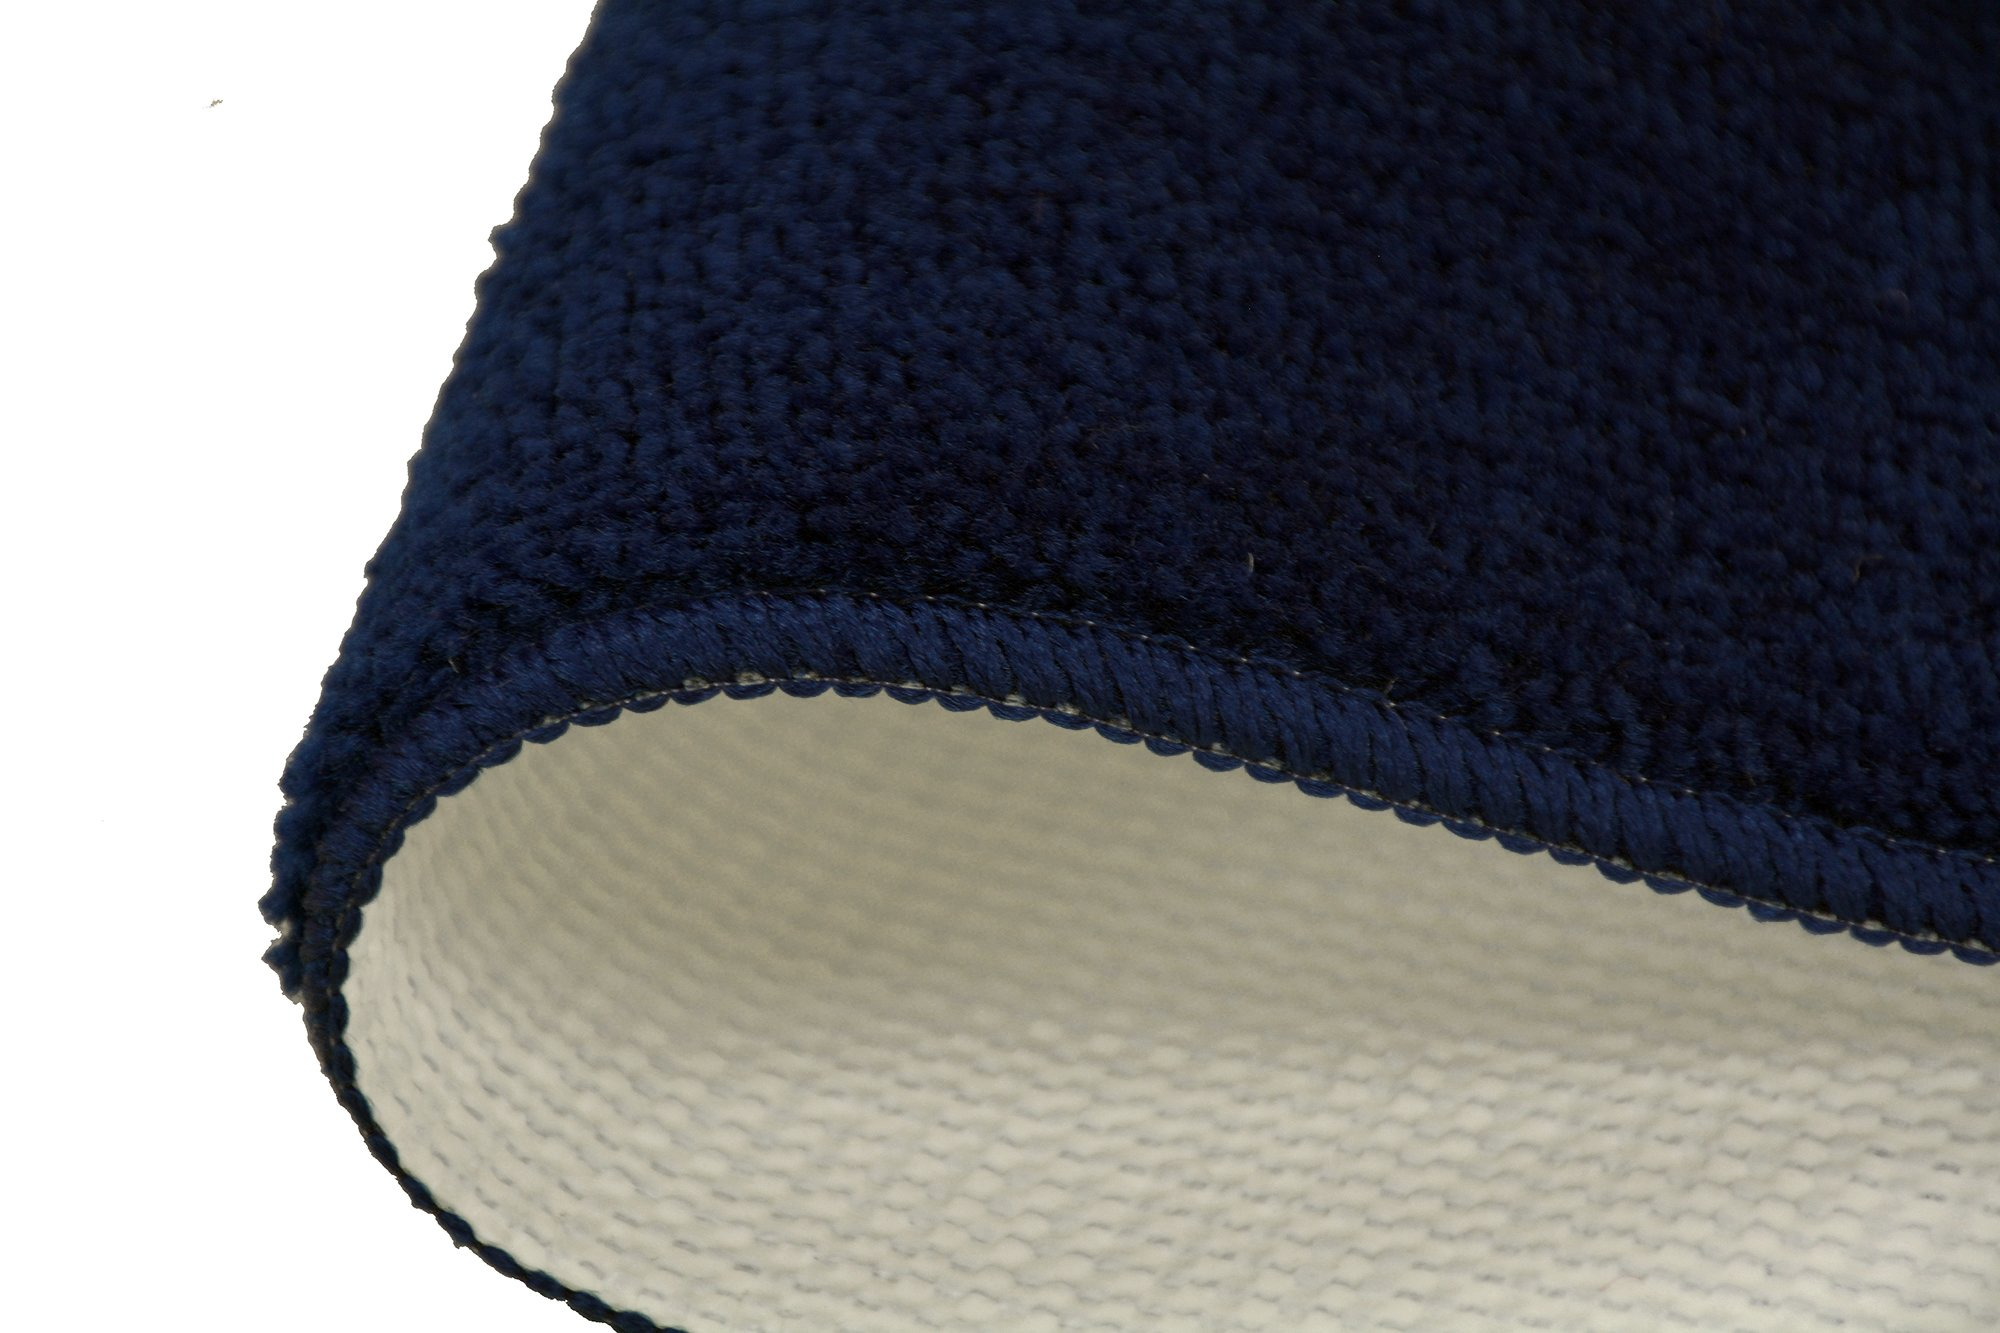 RugStylesOnline TRENDY-ST-8X30-NAVY-13 Trendy Stair Tread Treads Indoor Skid Slip Resistant Carpet Stair Tread Treads Machine Washable 8 ½'' W x 30'' L, Royal Navy Blue, Set of 13 by RugStylesOnline (Image #4)